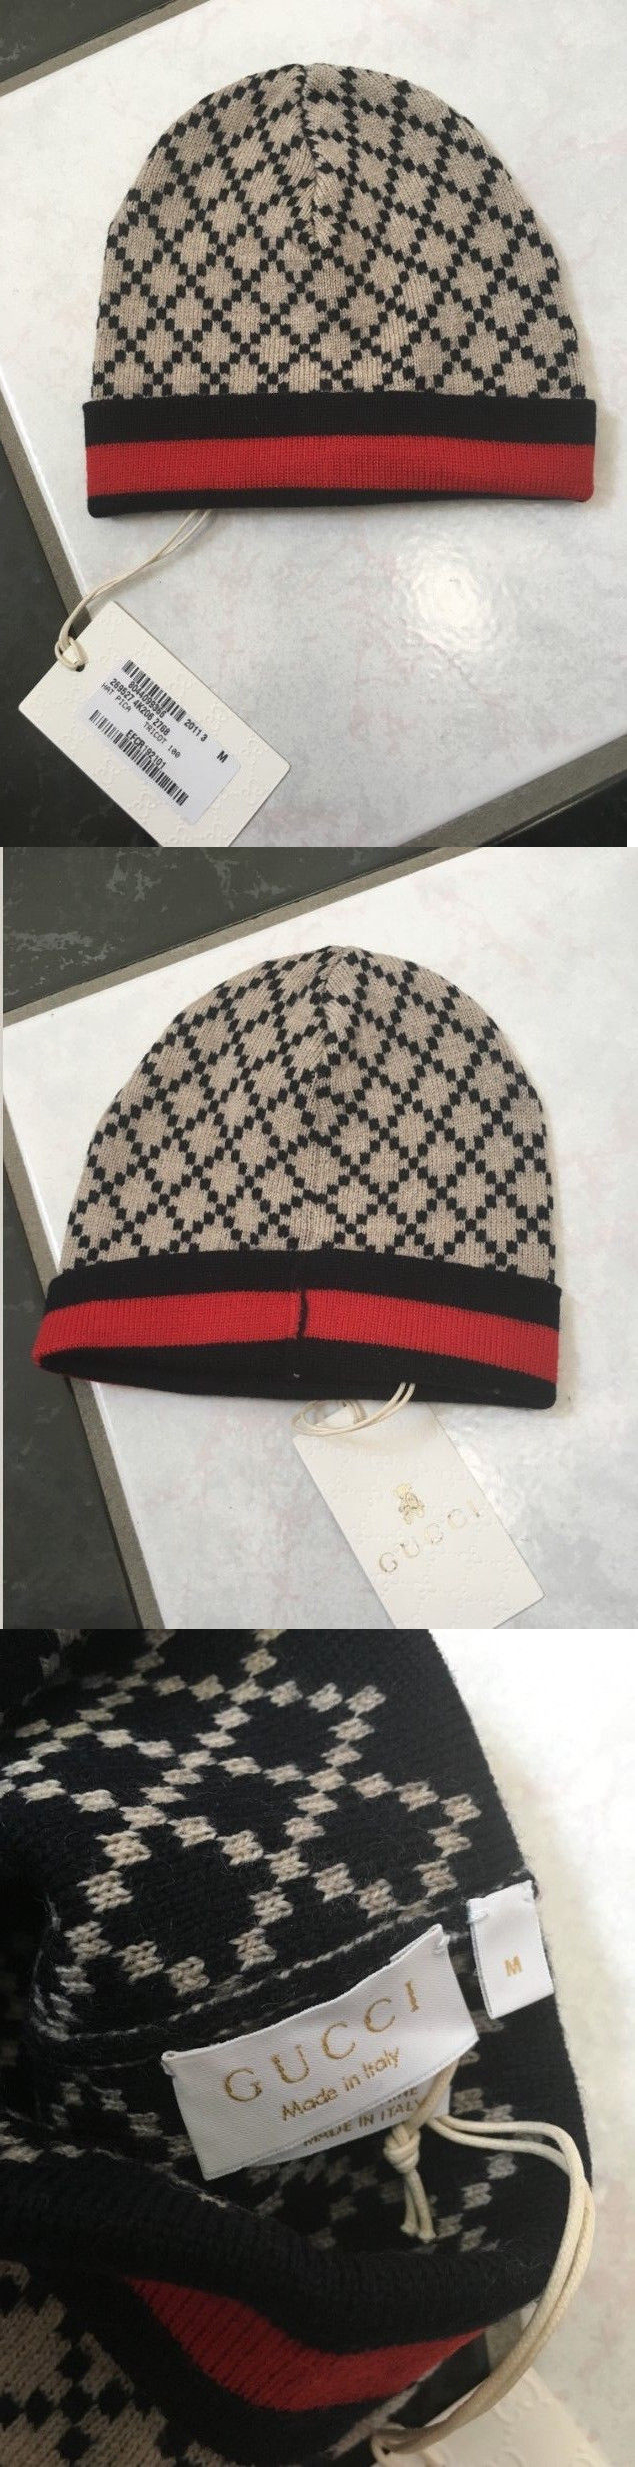 41022052c Hats 163224: Nwt 100% Auth Gucci Baby Boys Navy Blue Diamante Beanie ...